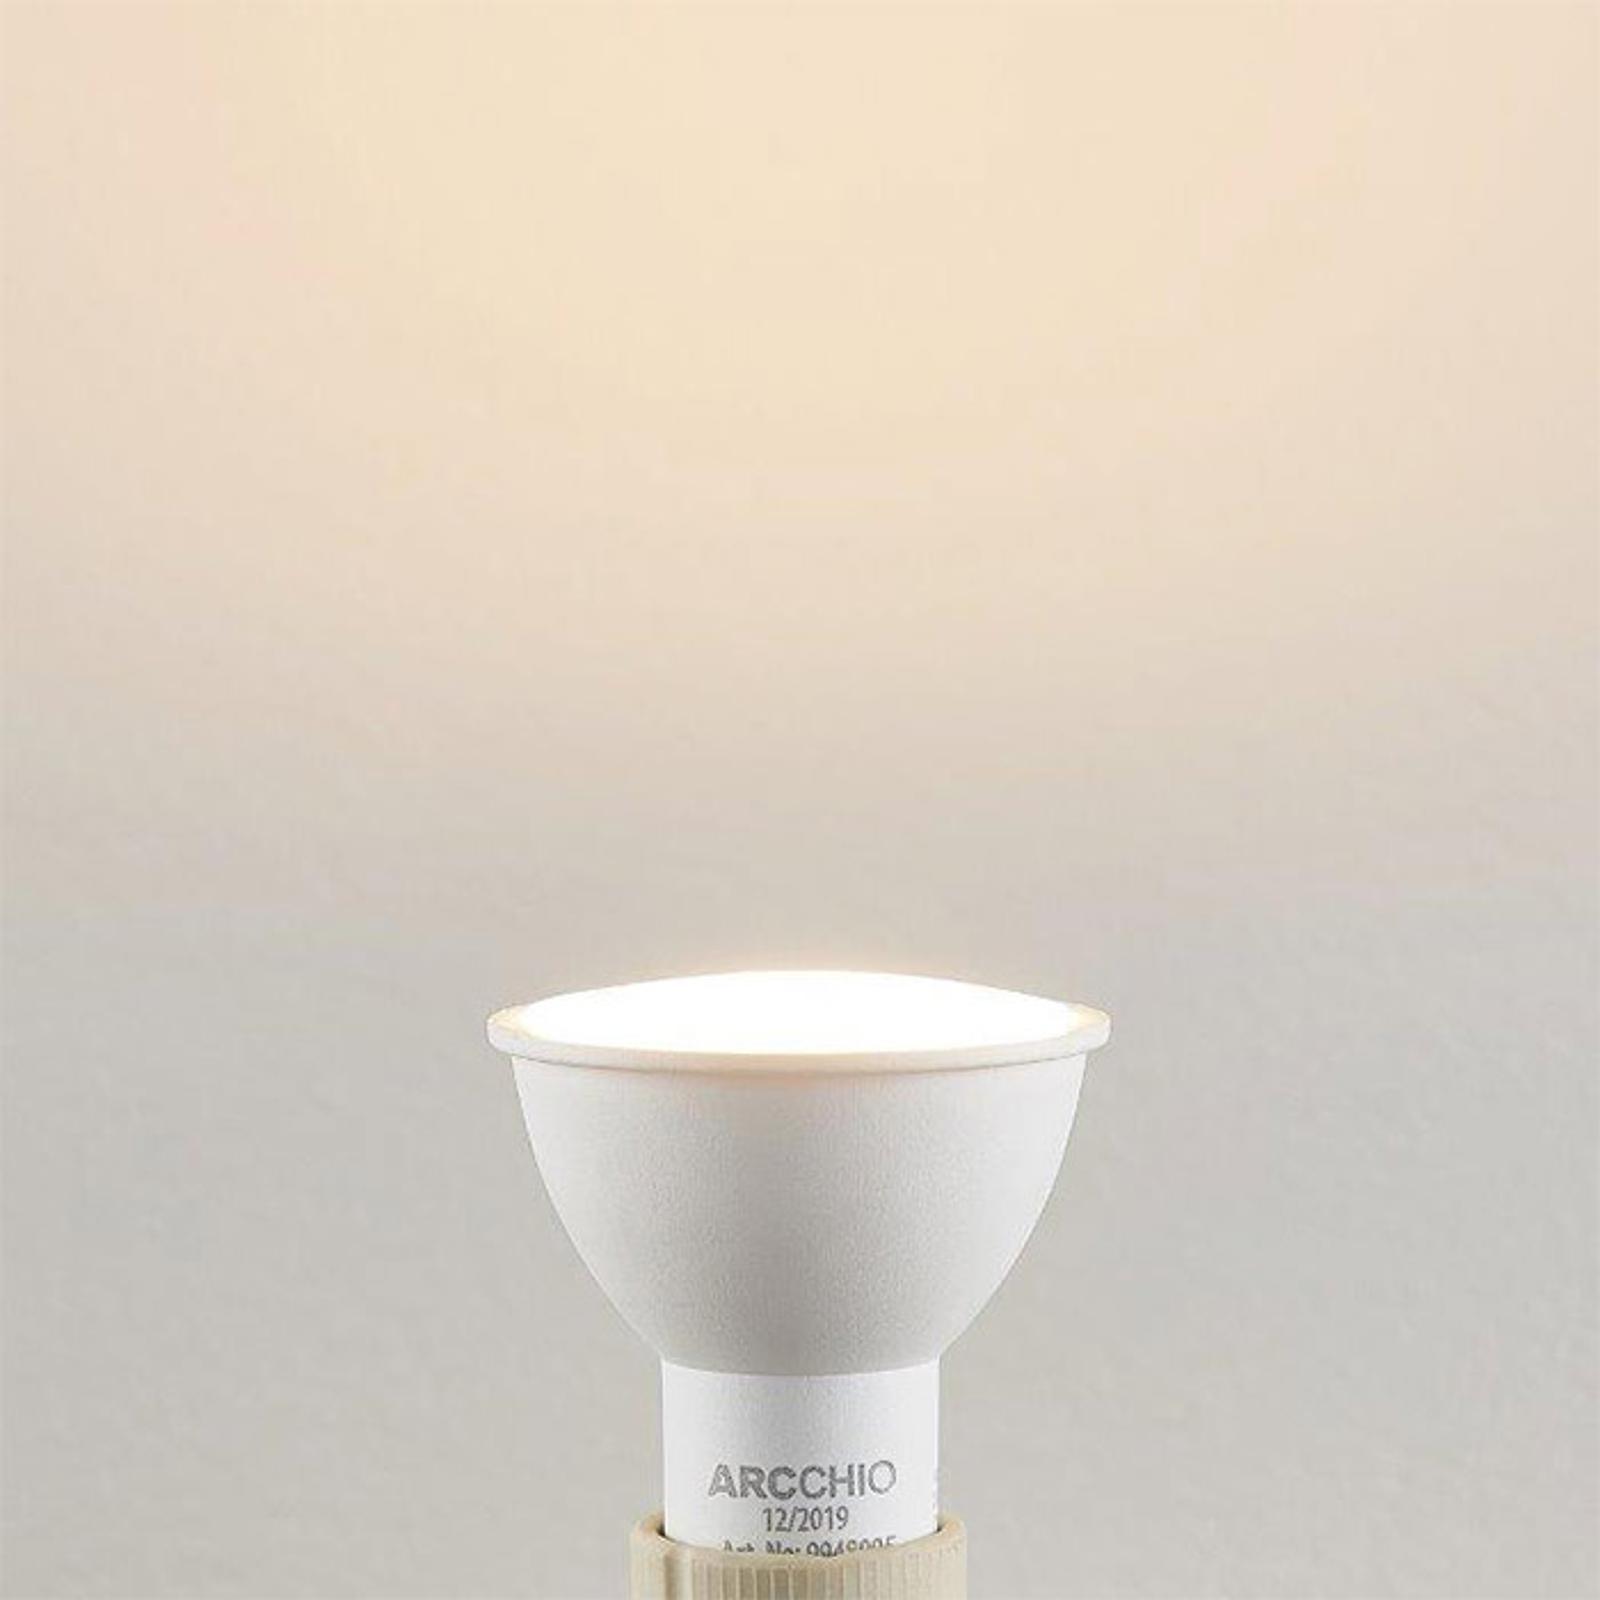 LED-heijastinlamppu GU10 7 W 3 000 K 120°